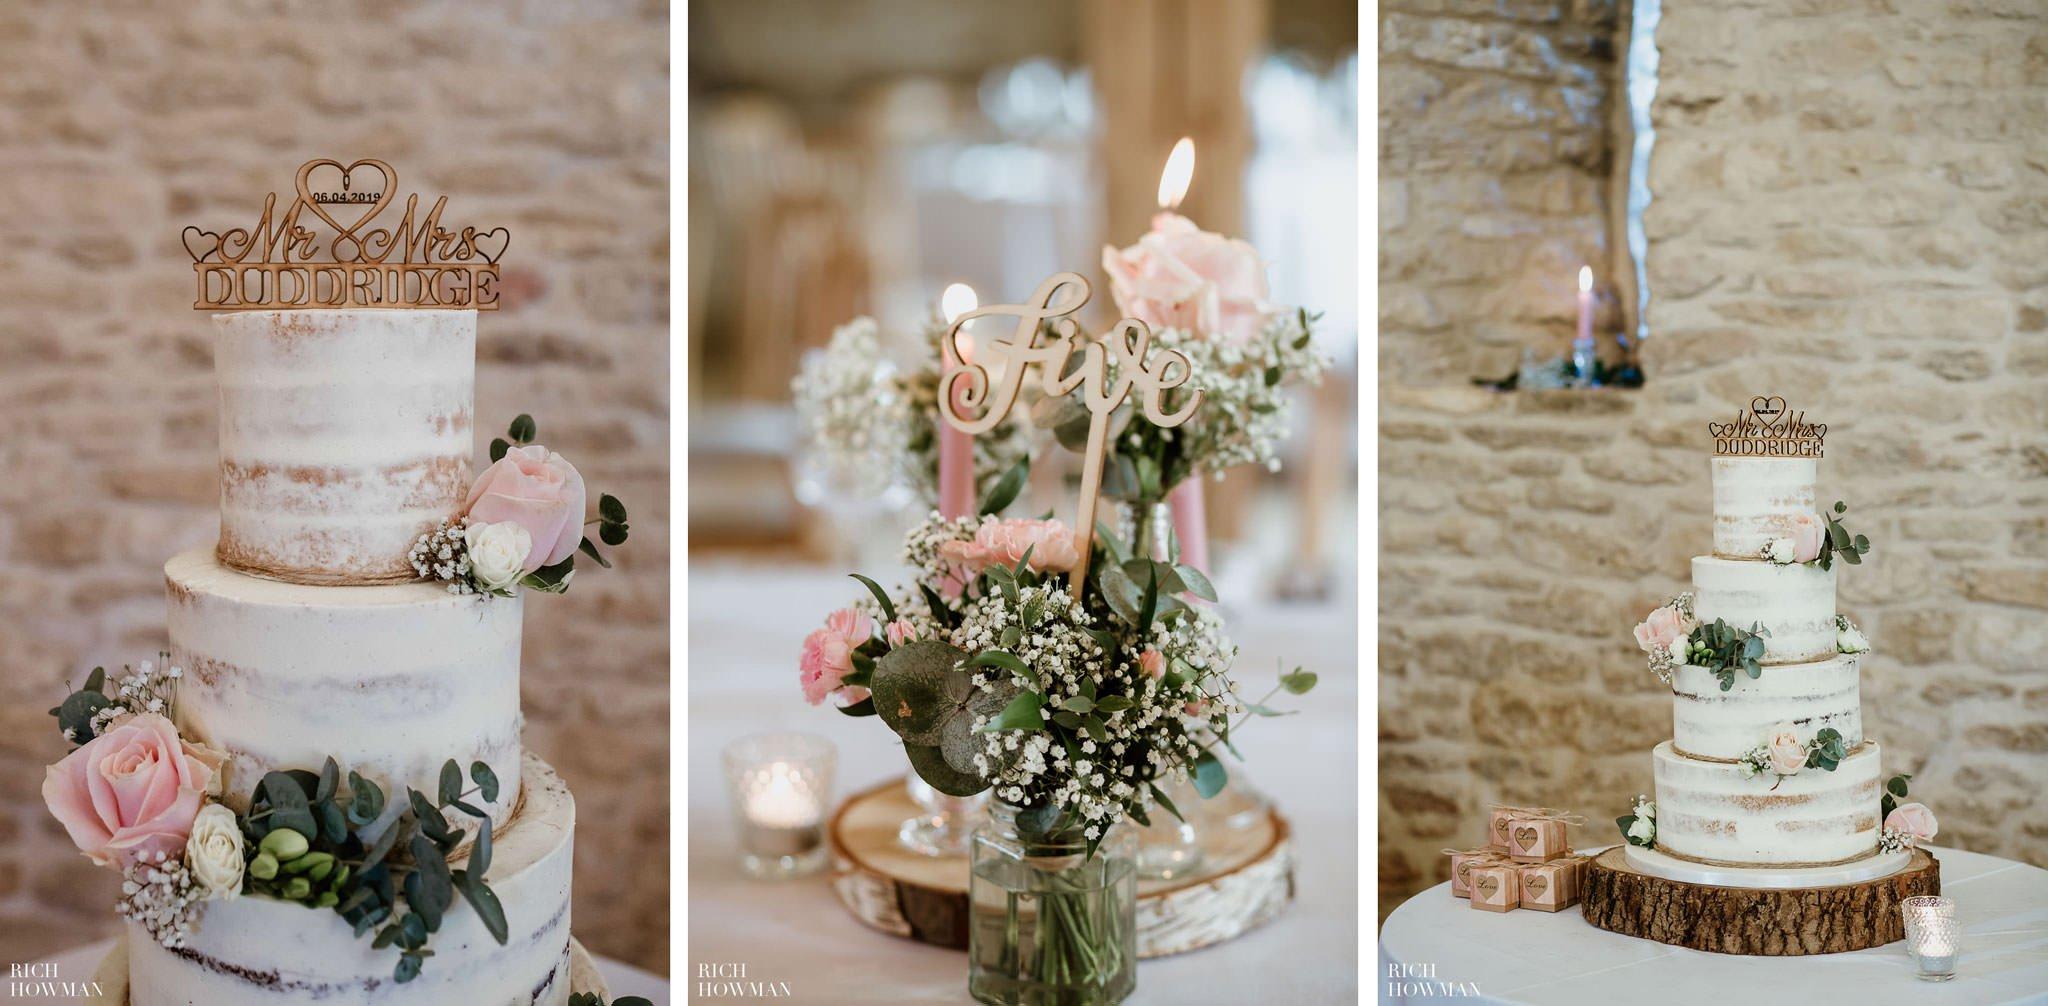 Kingscote Barn Wedding Photographer in Gloucestershire 564